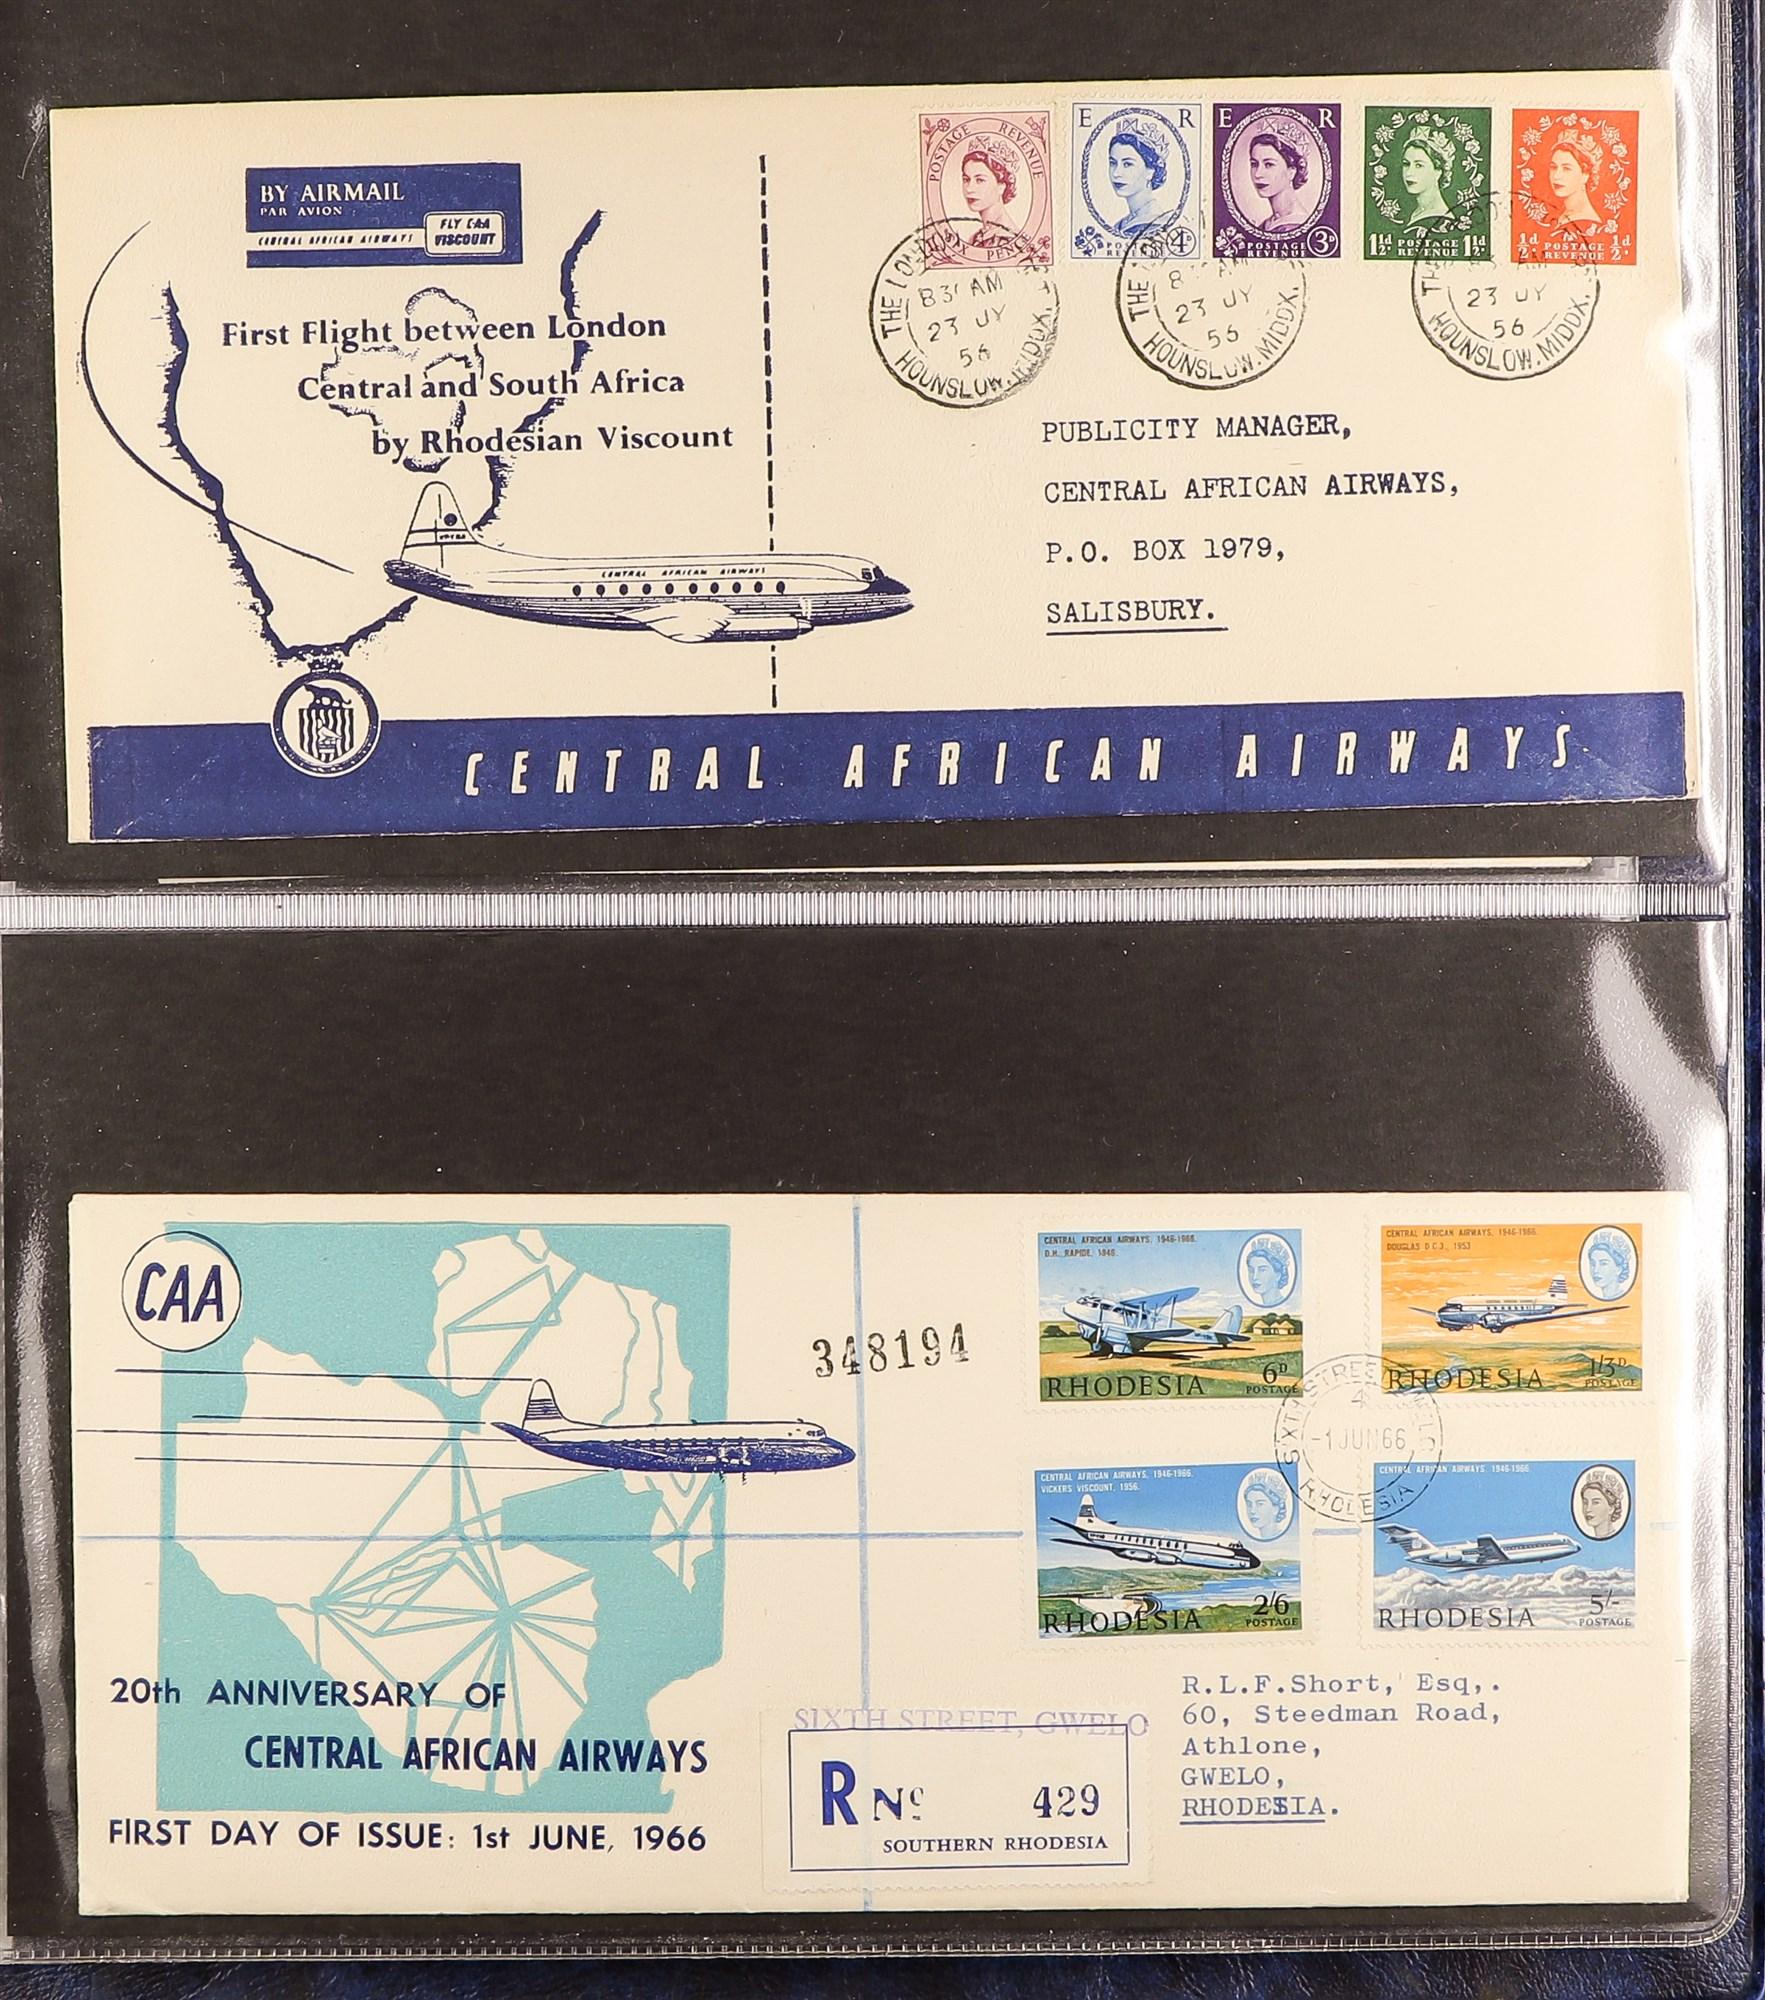 RHODESIA AIRMAIL COVERS COLLECTION 1930's-60's with Rhodesian & Nyasaland Airways (15), Nyasaland- - Image 7 of 10